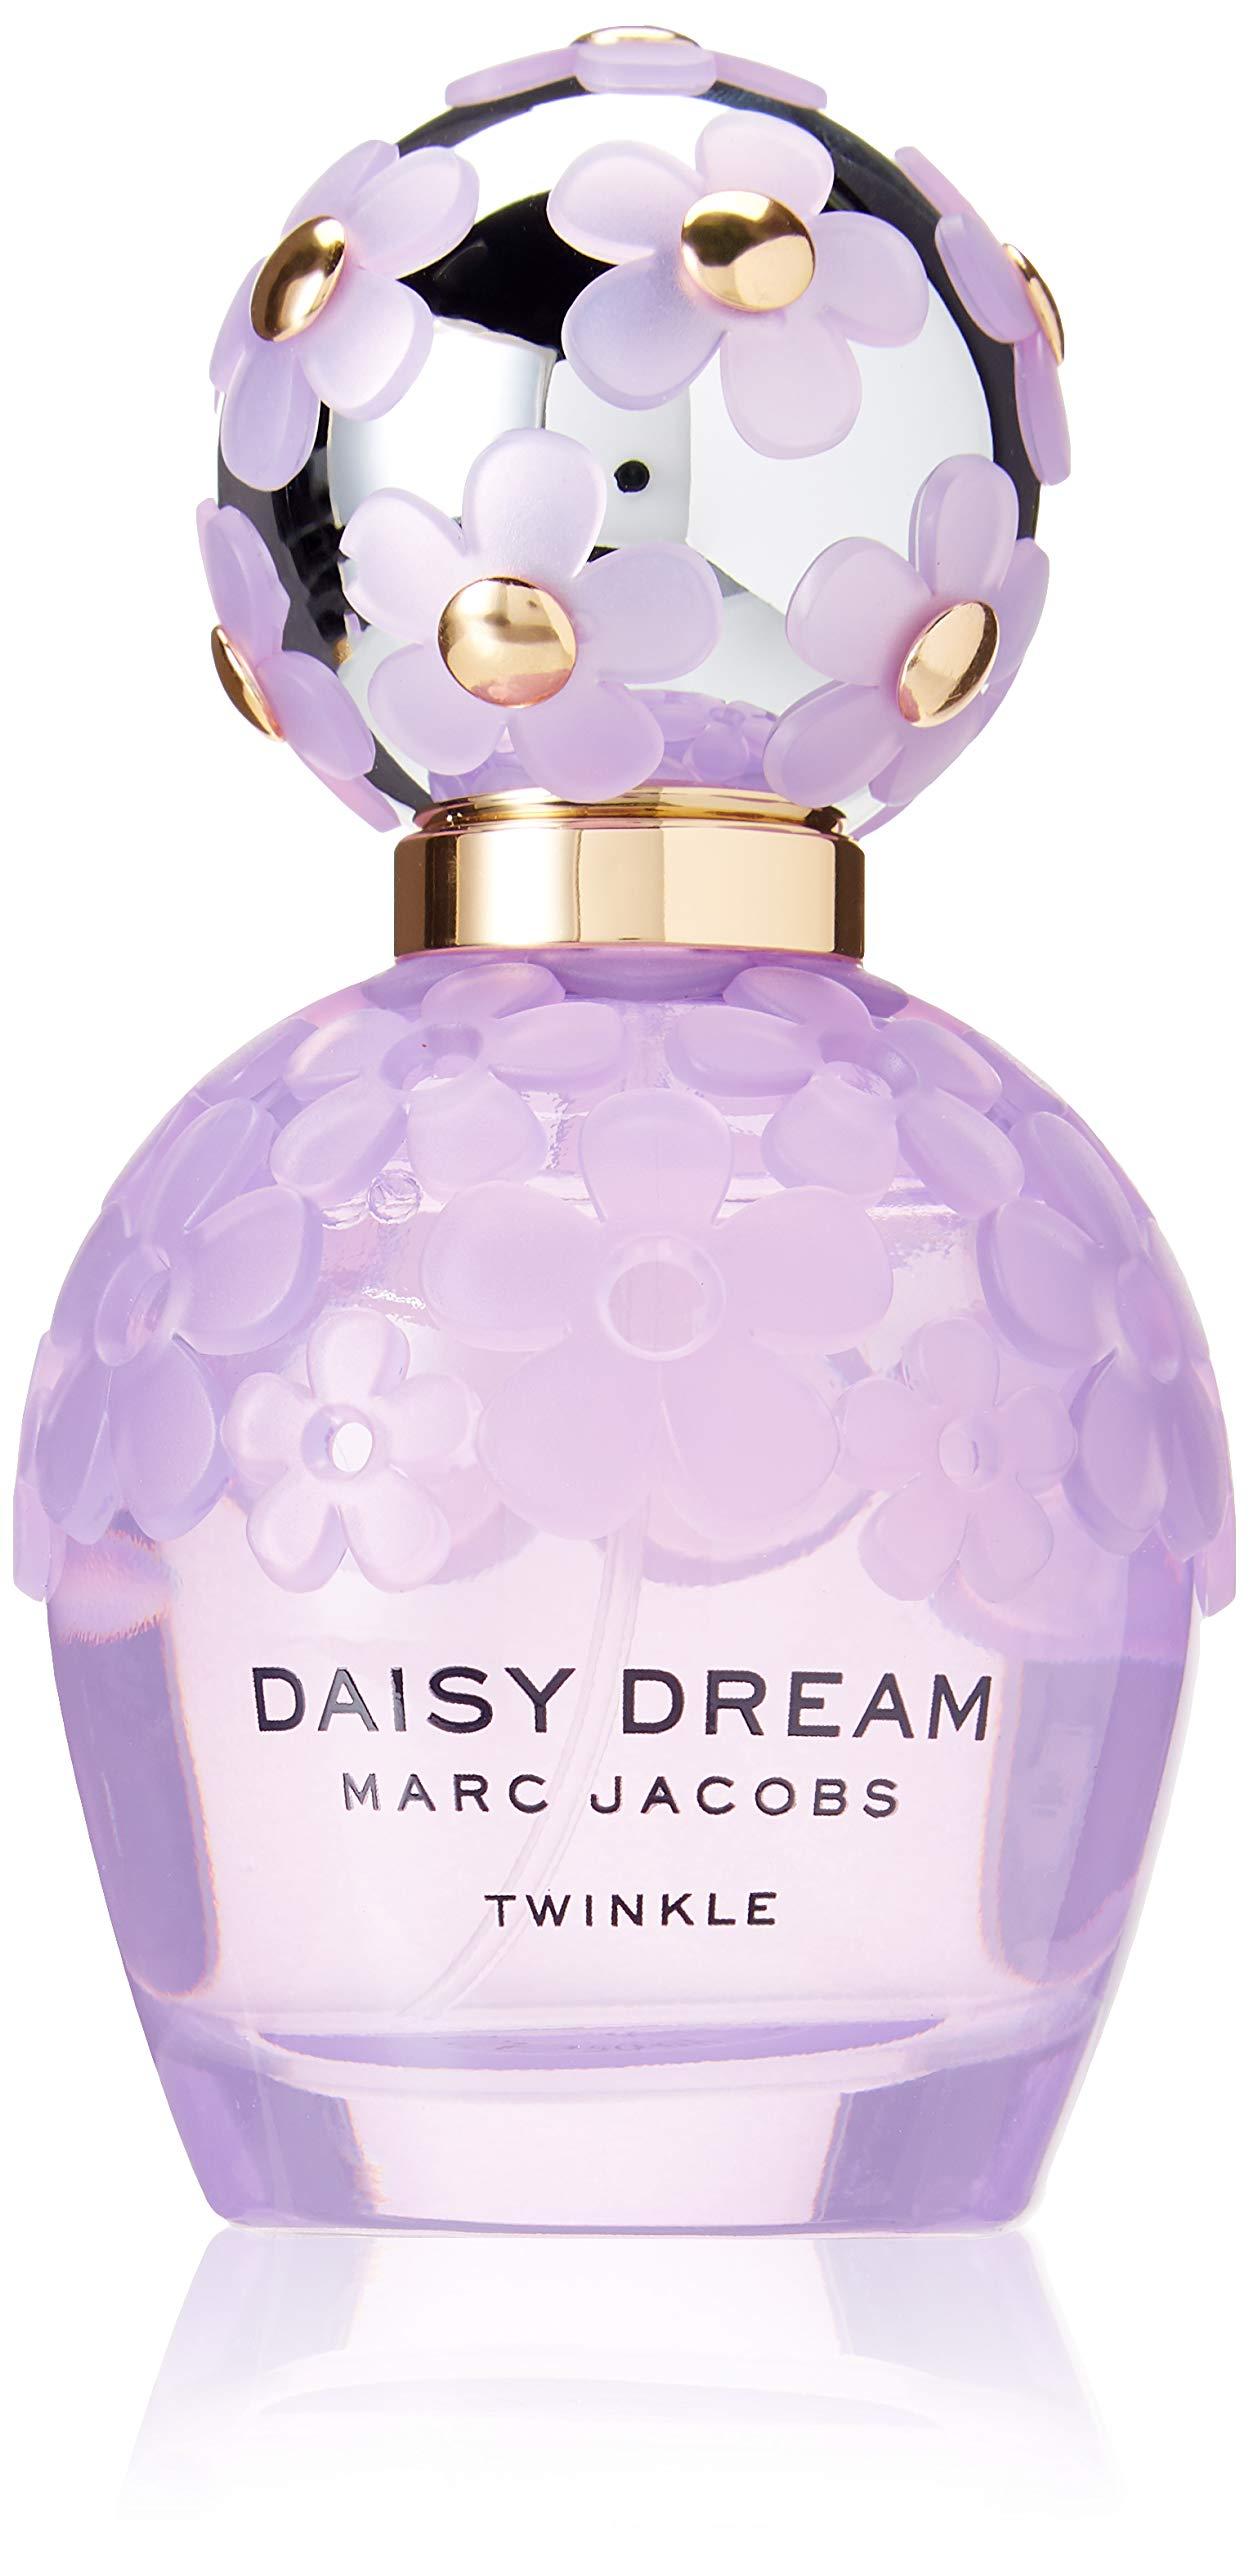 Marc Jacobs - Marc Jacobs Daisy Dream Twinkle for Women Eau de Toilette Spray, 1.7 Ounce (New)